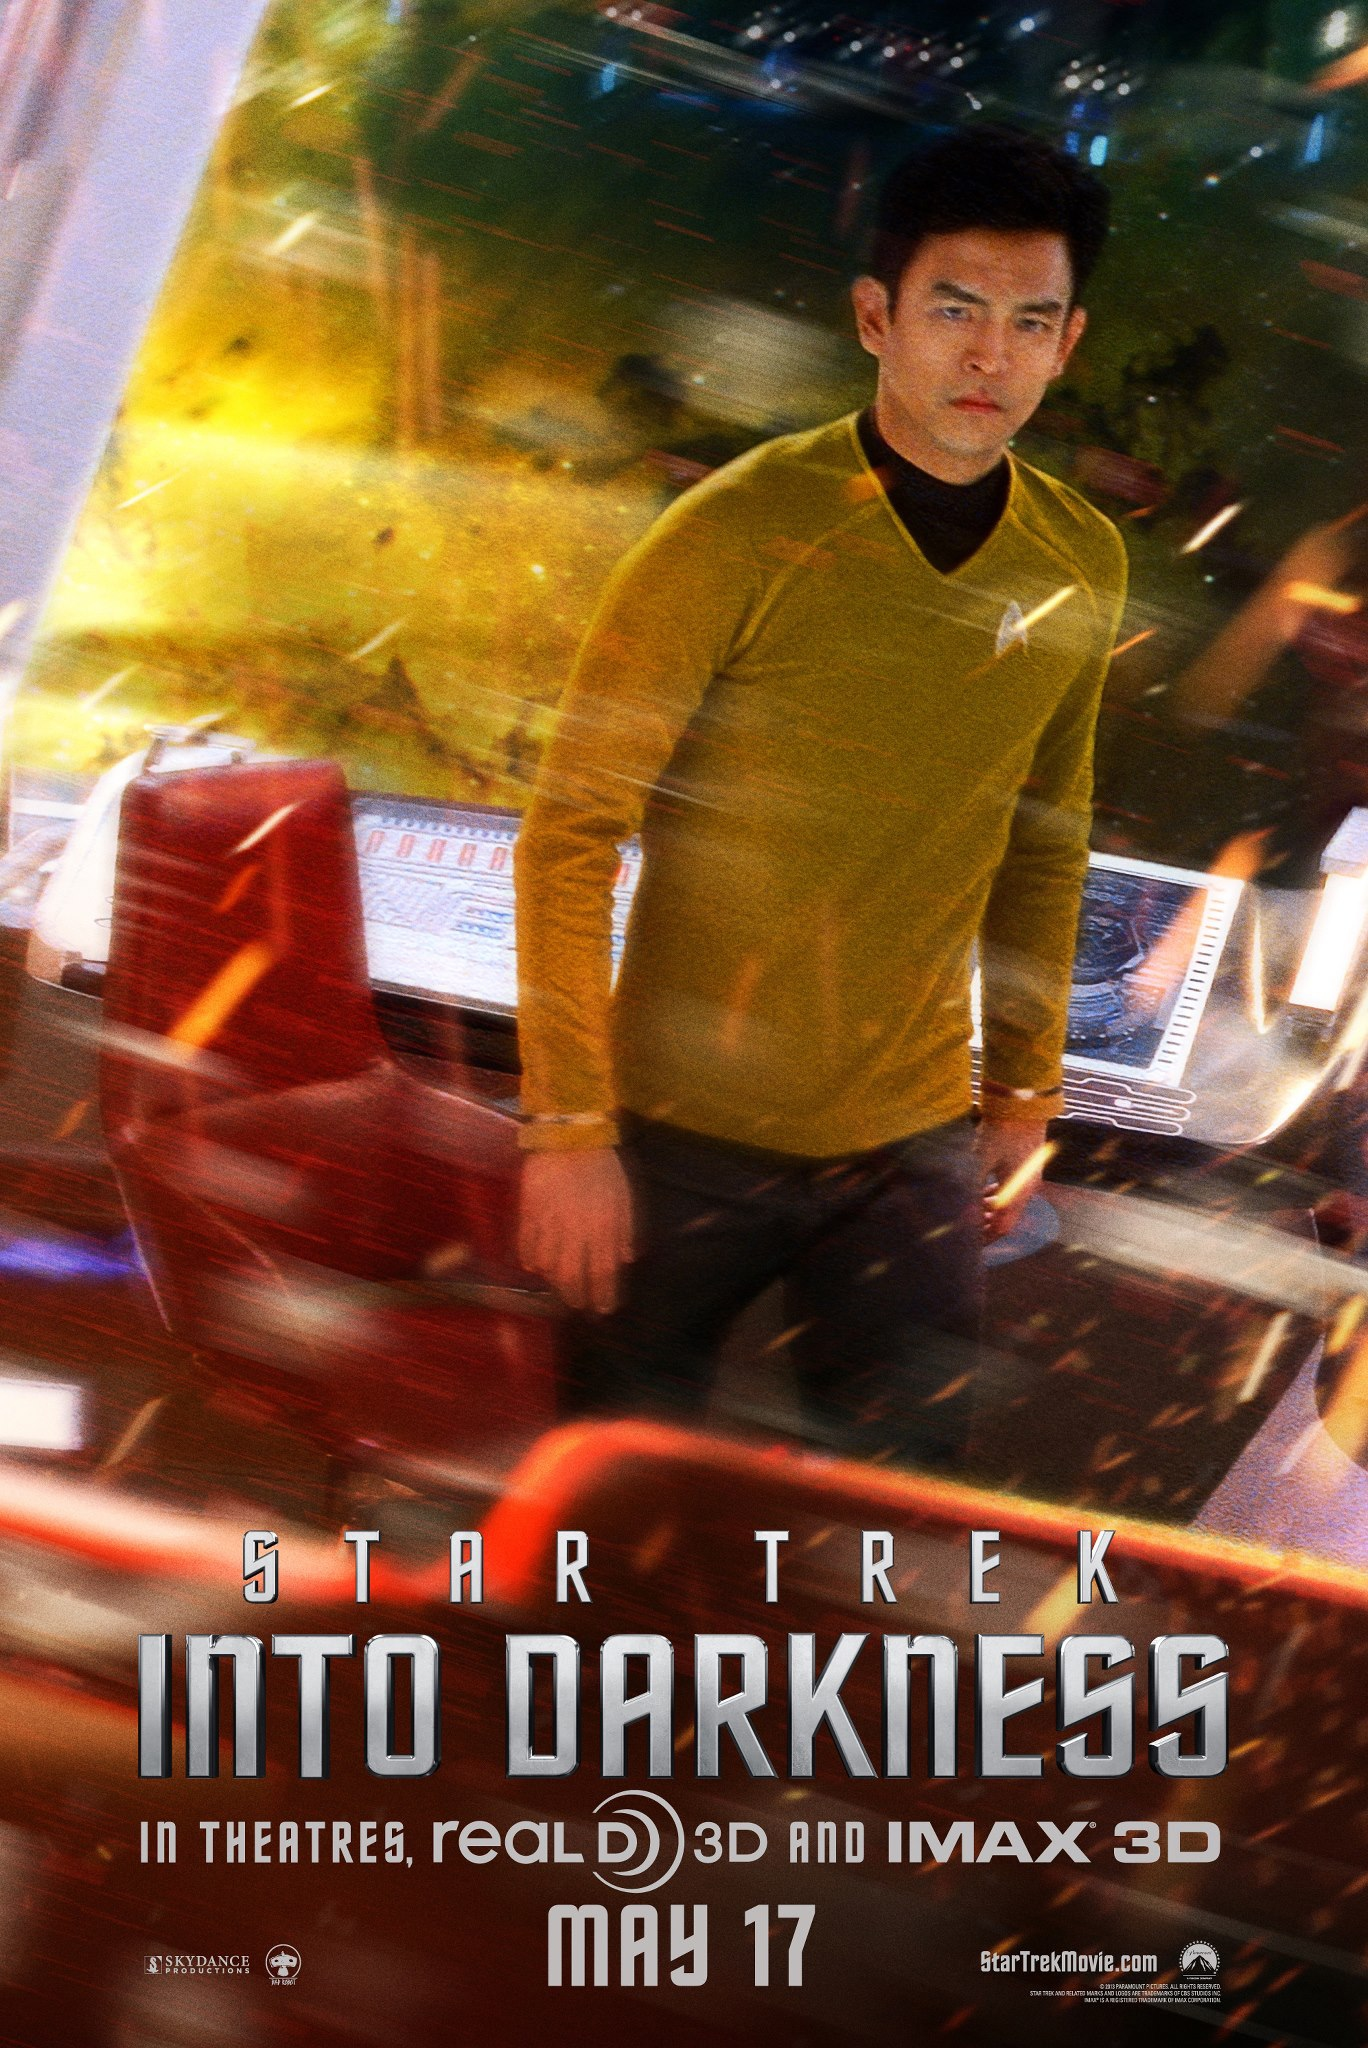 Star Trek Into Darkness - Movie Poster #8 (Original)